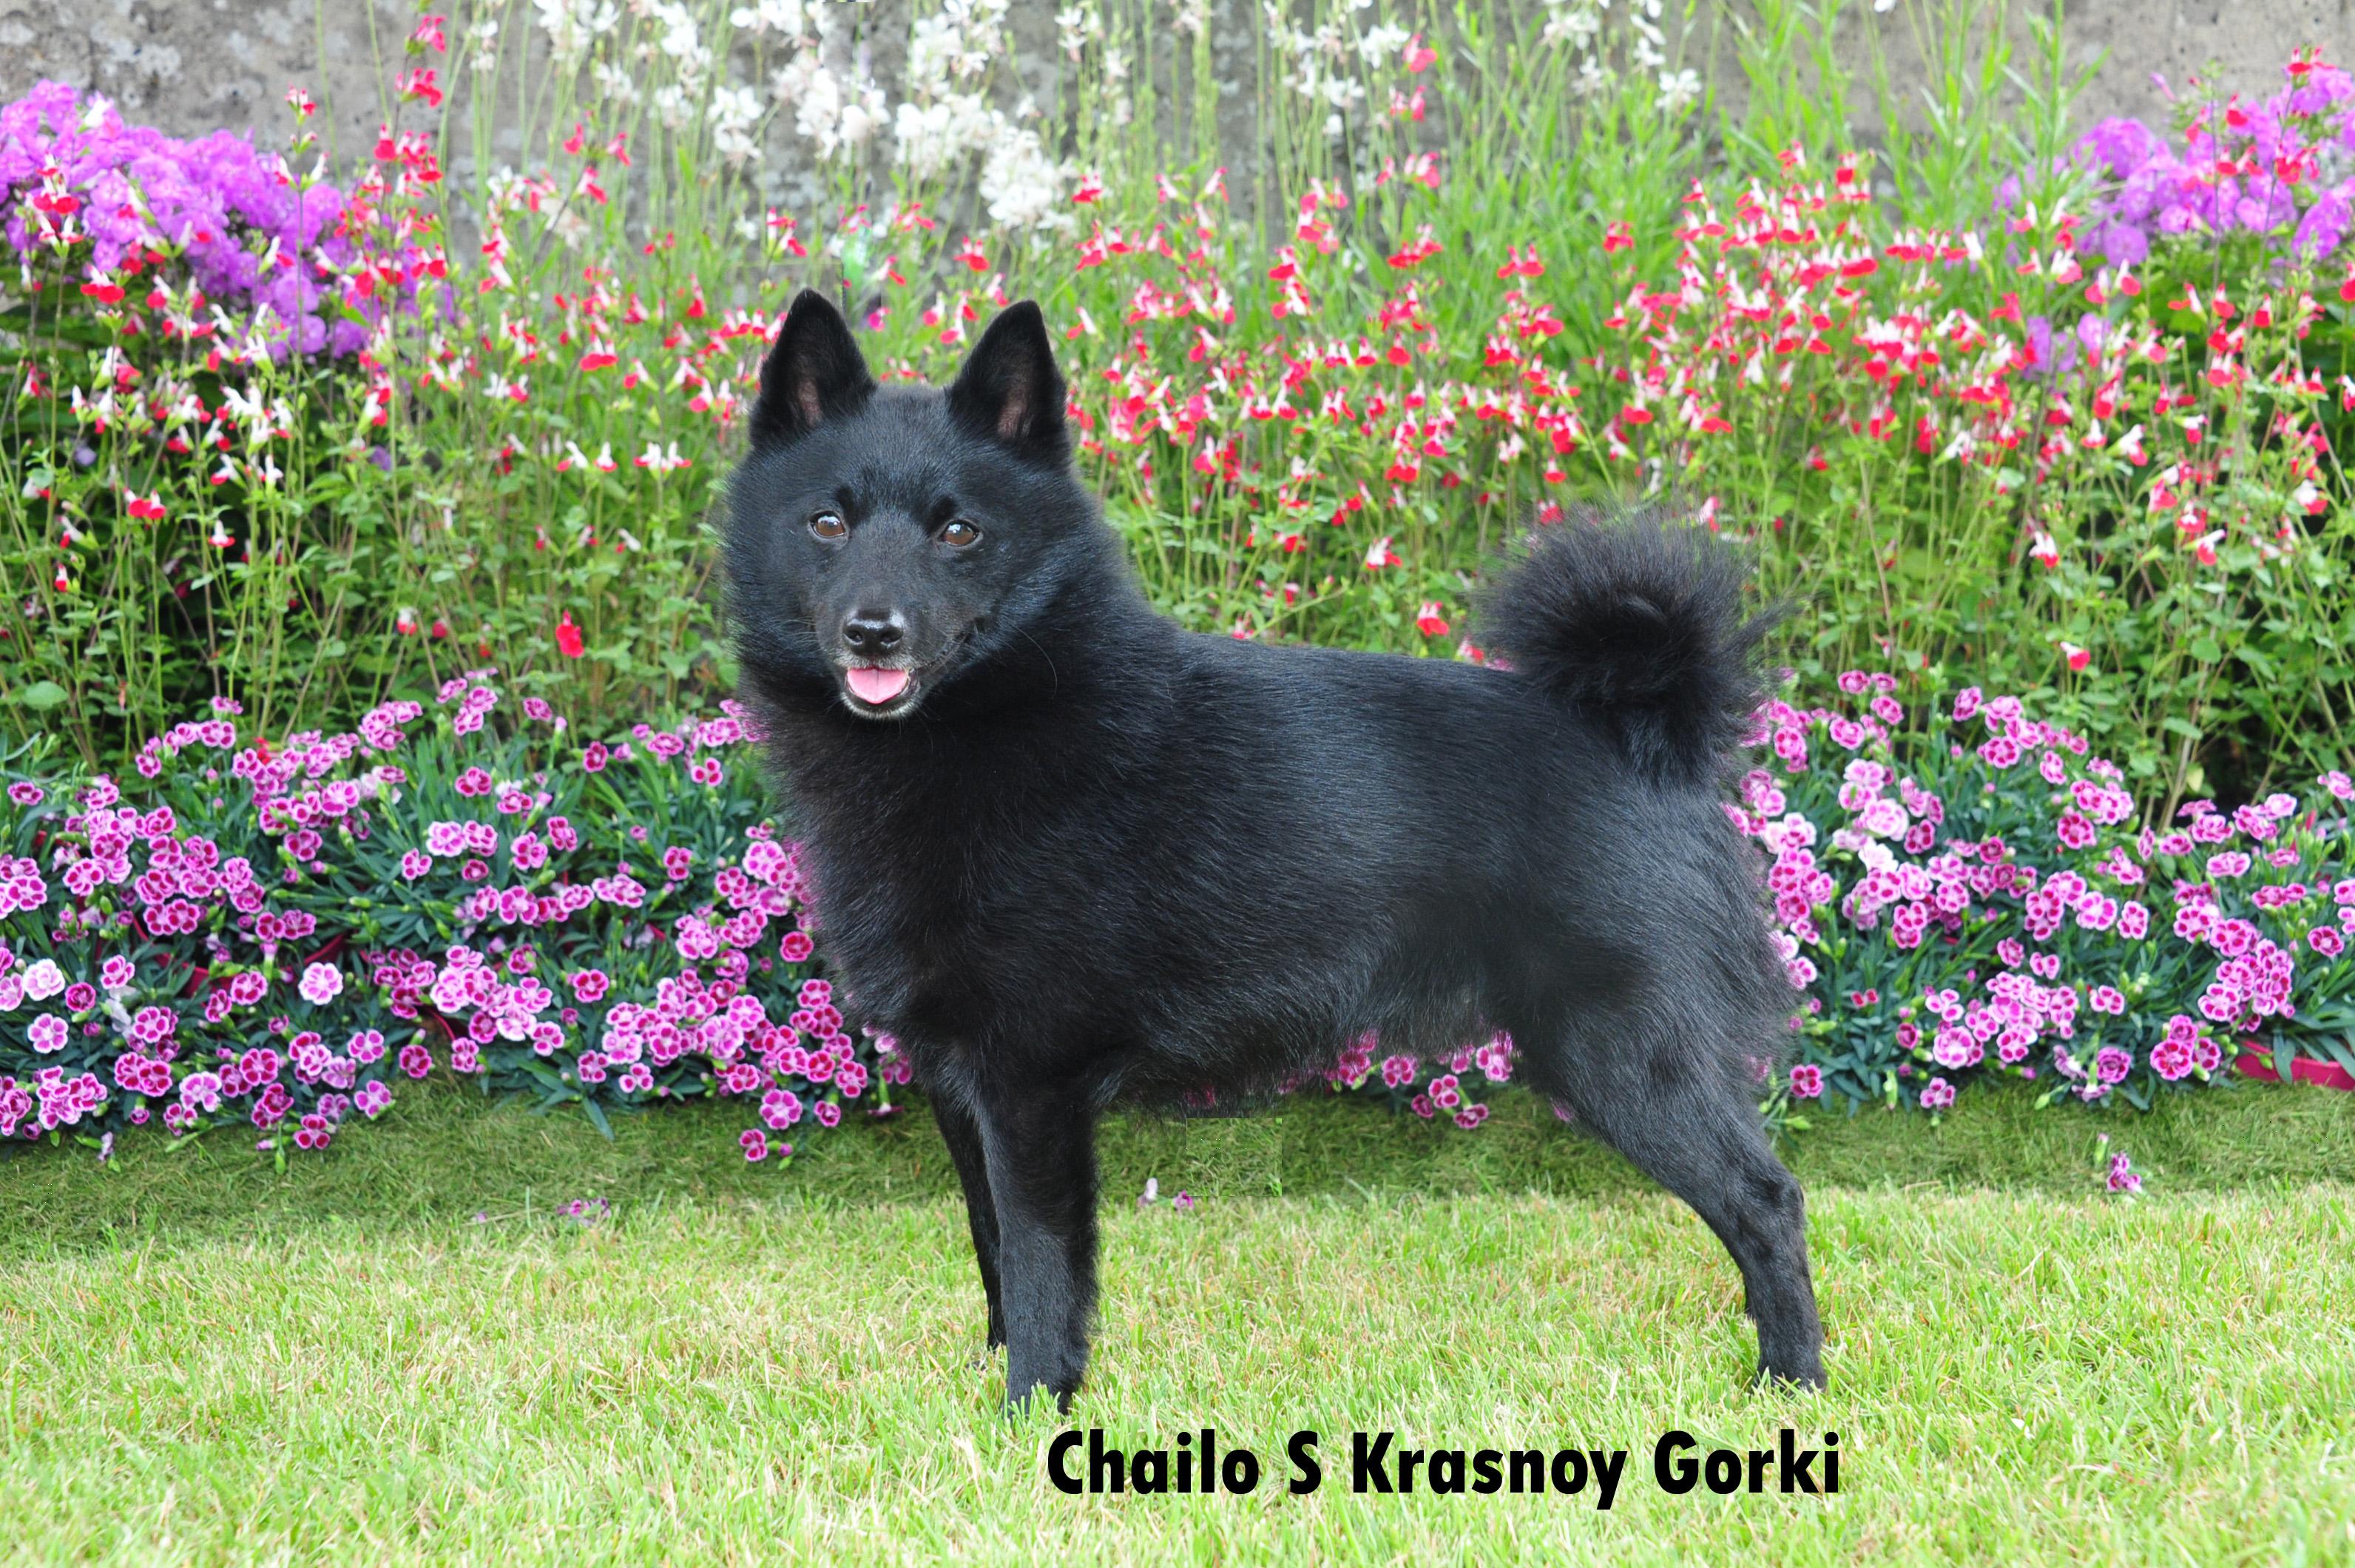 45-ChM Ex-Chailo S Krasnoy Gorki (NL)- (3C)